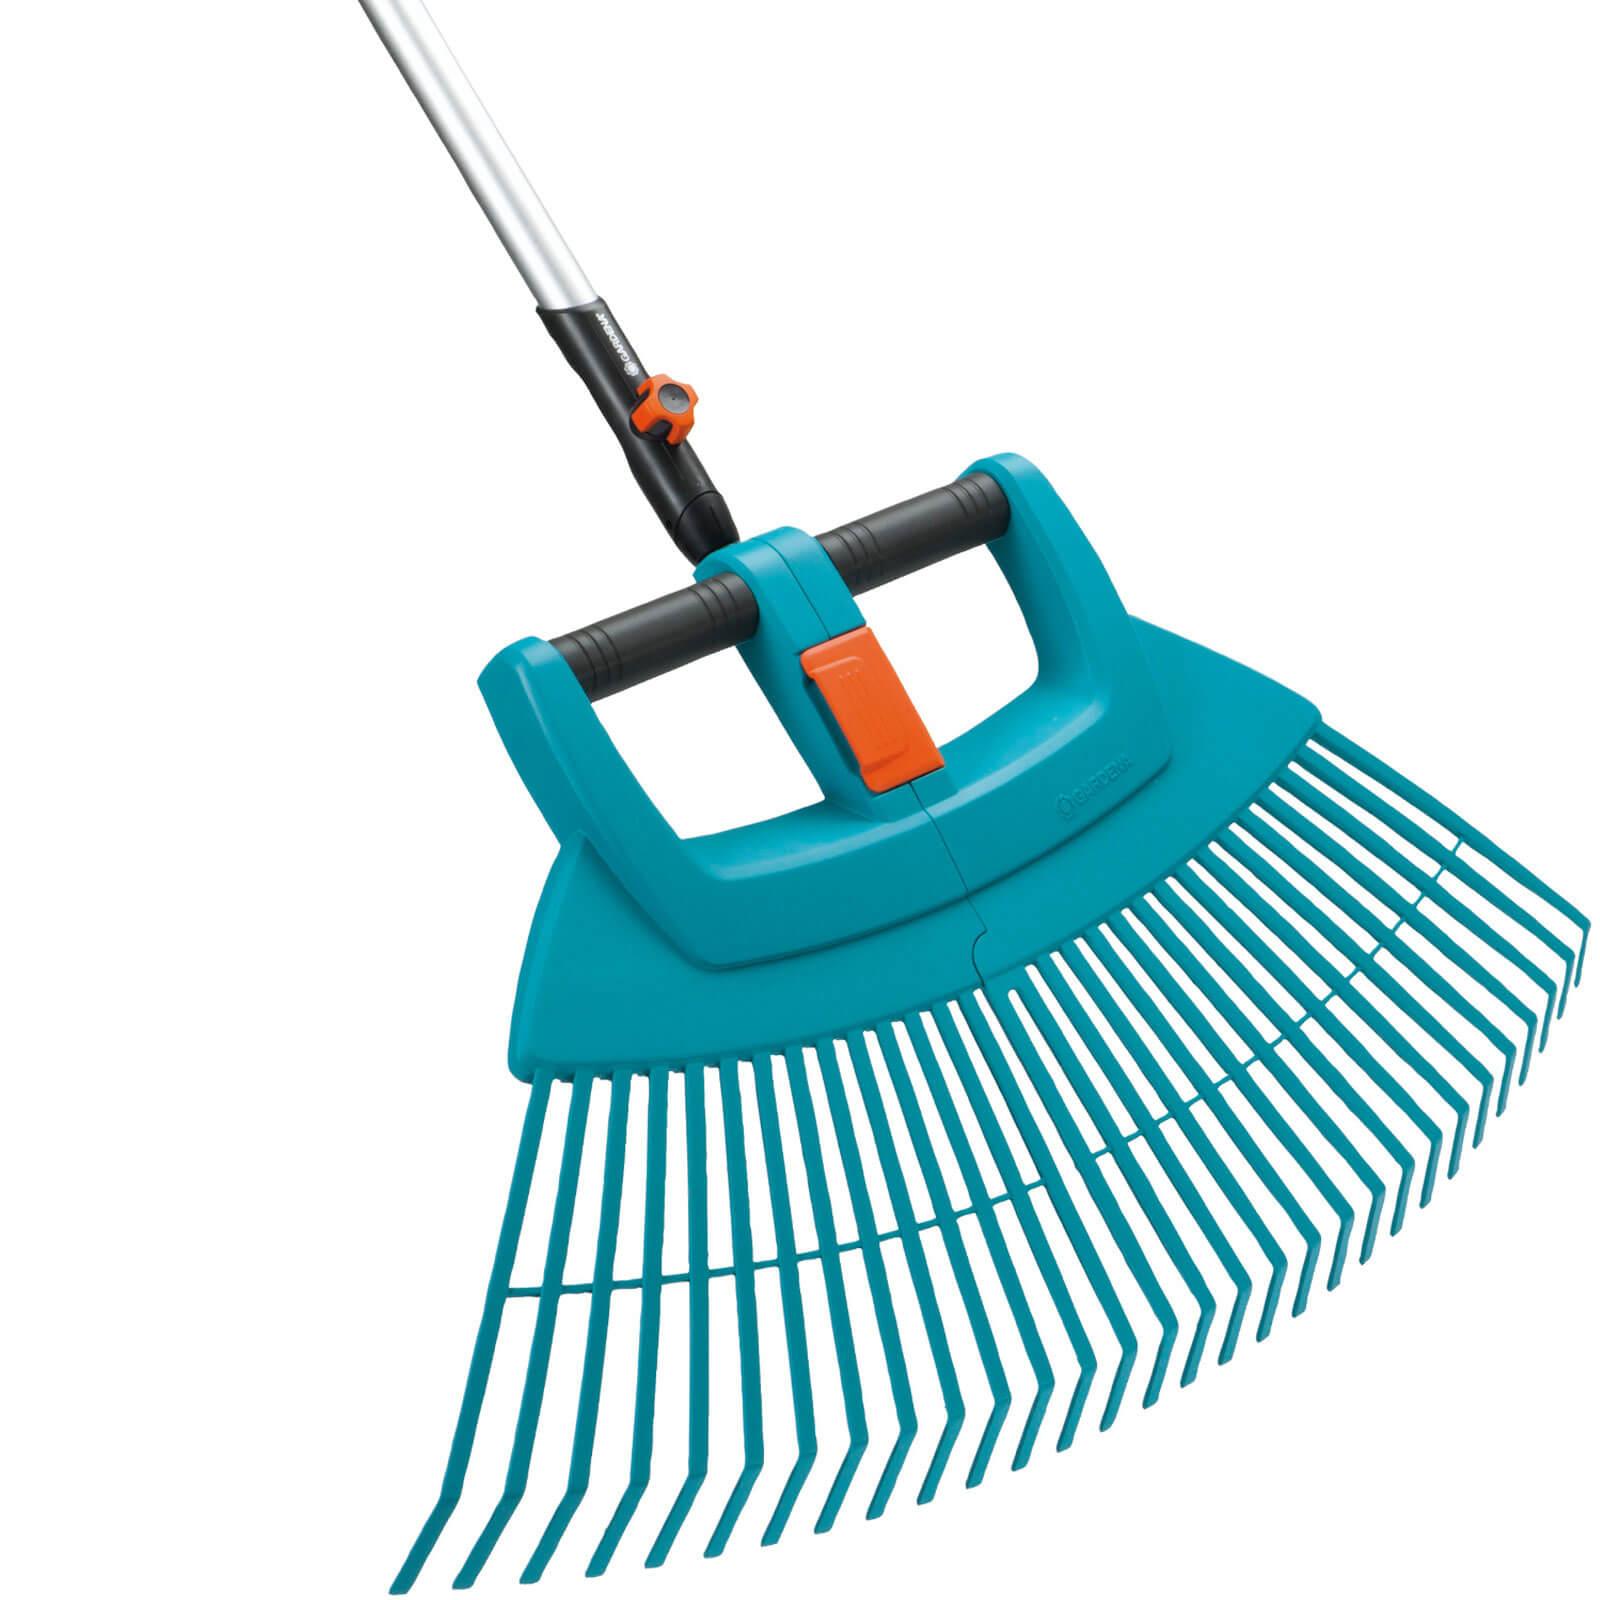 garden hand tools gardena combisystem plastic fan rake. Black Bedroom Furniture Sets. Home Design Ideas